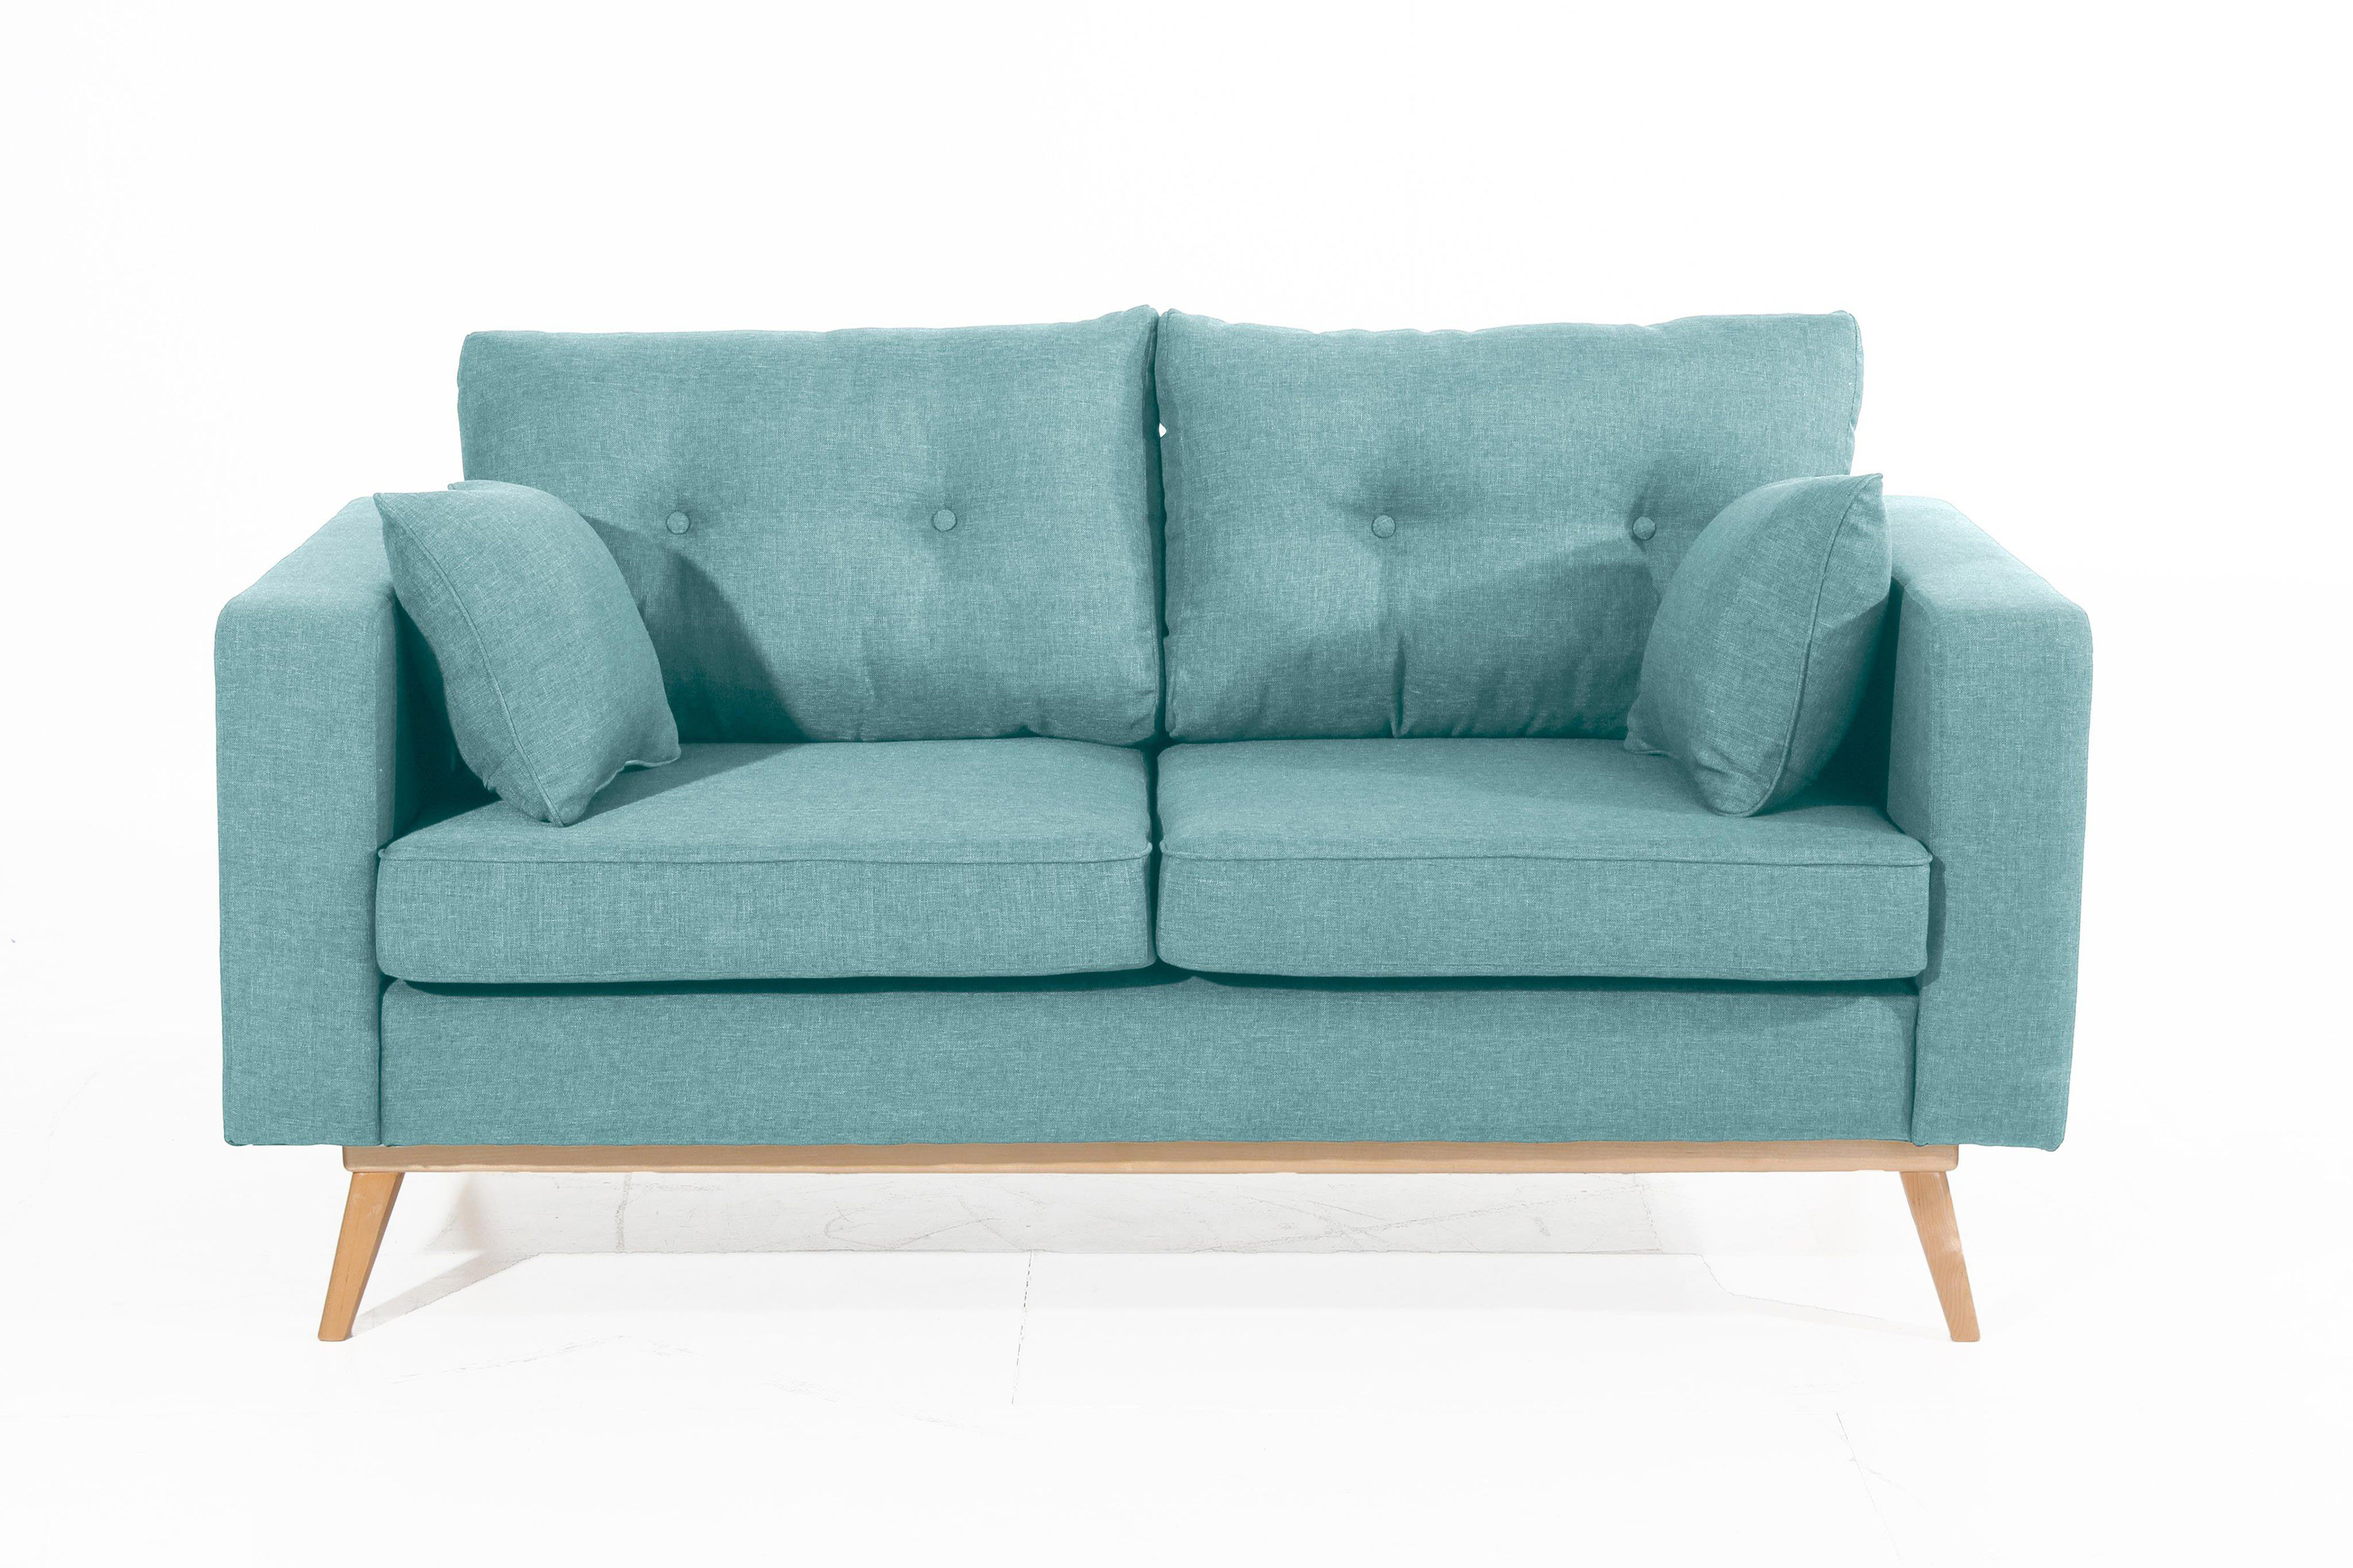 max winzer tomme garnitur blau m bel letz ihr online shop. Black Bedroom Furniture Sets. Home Design Ideas